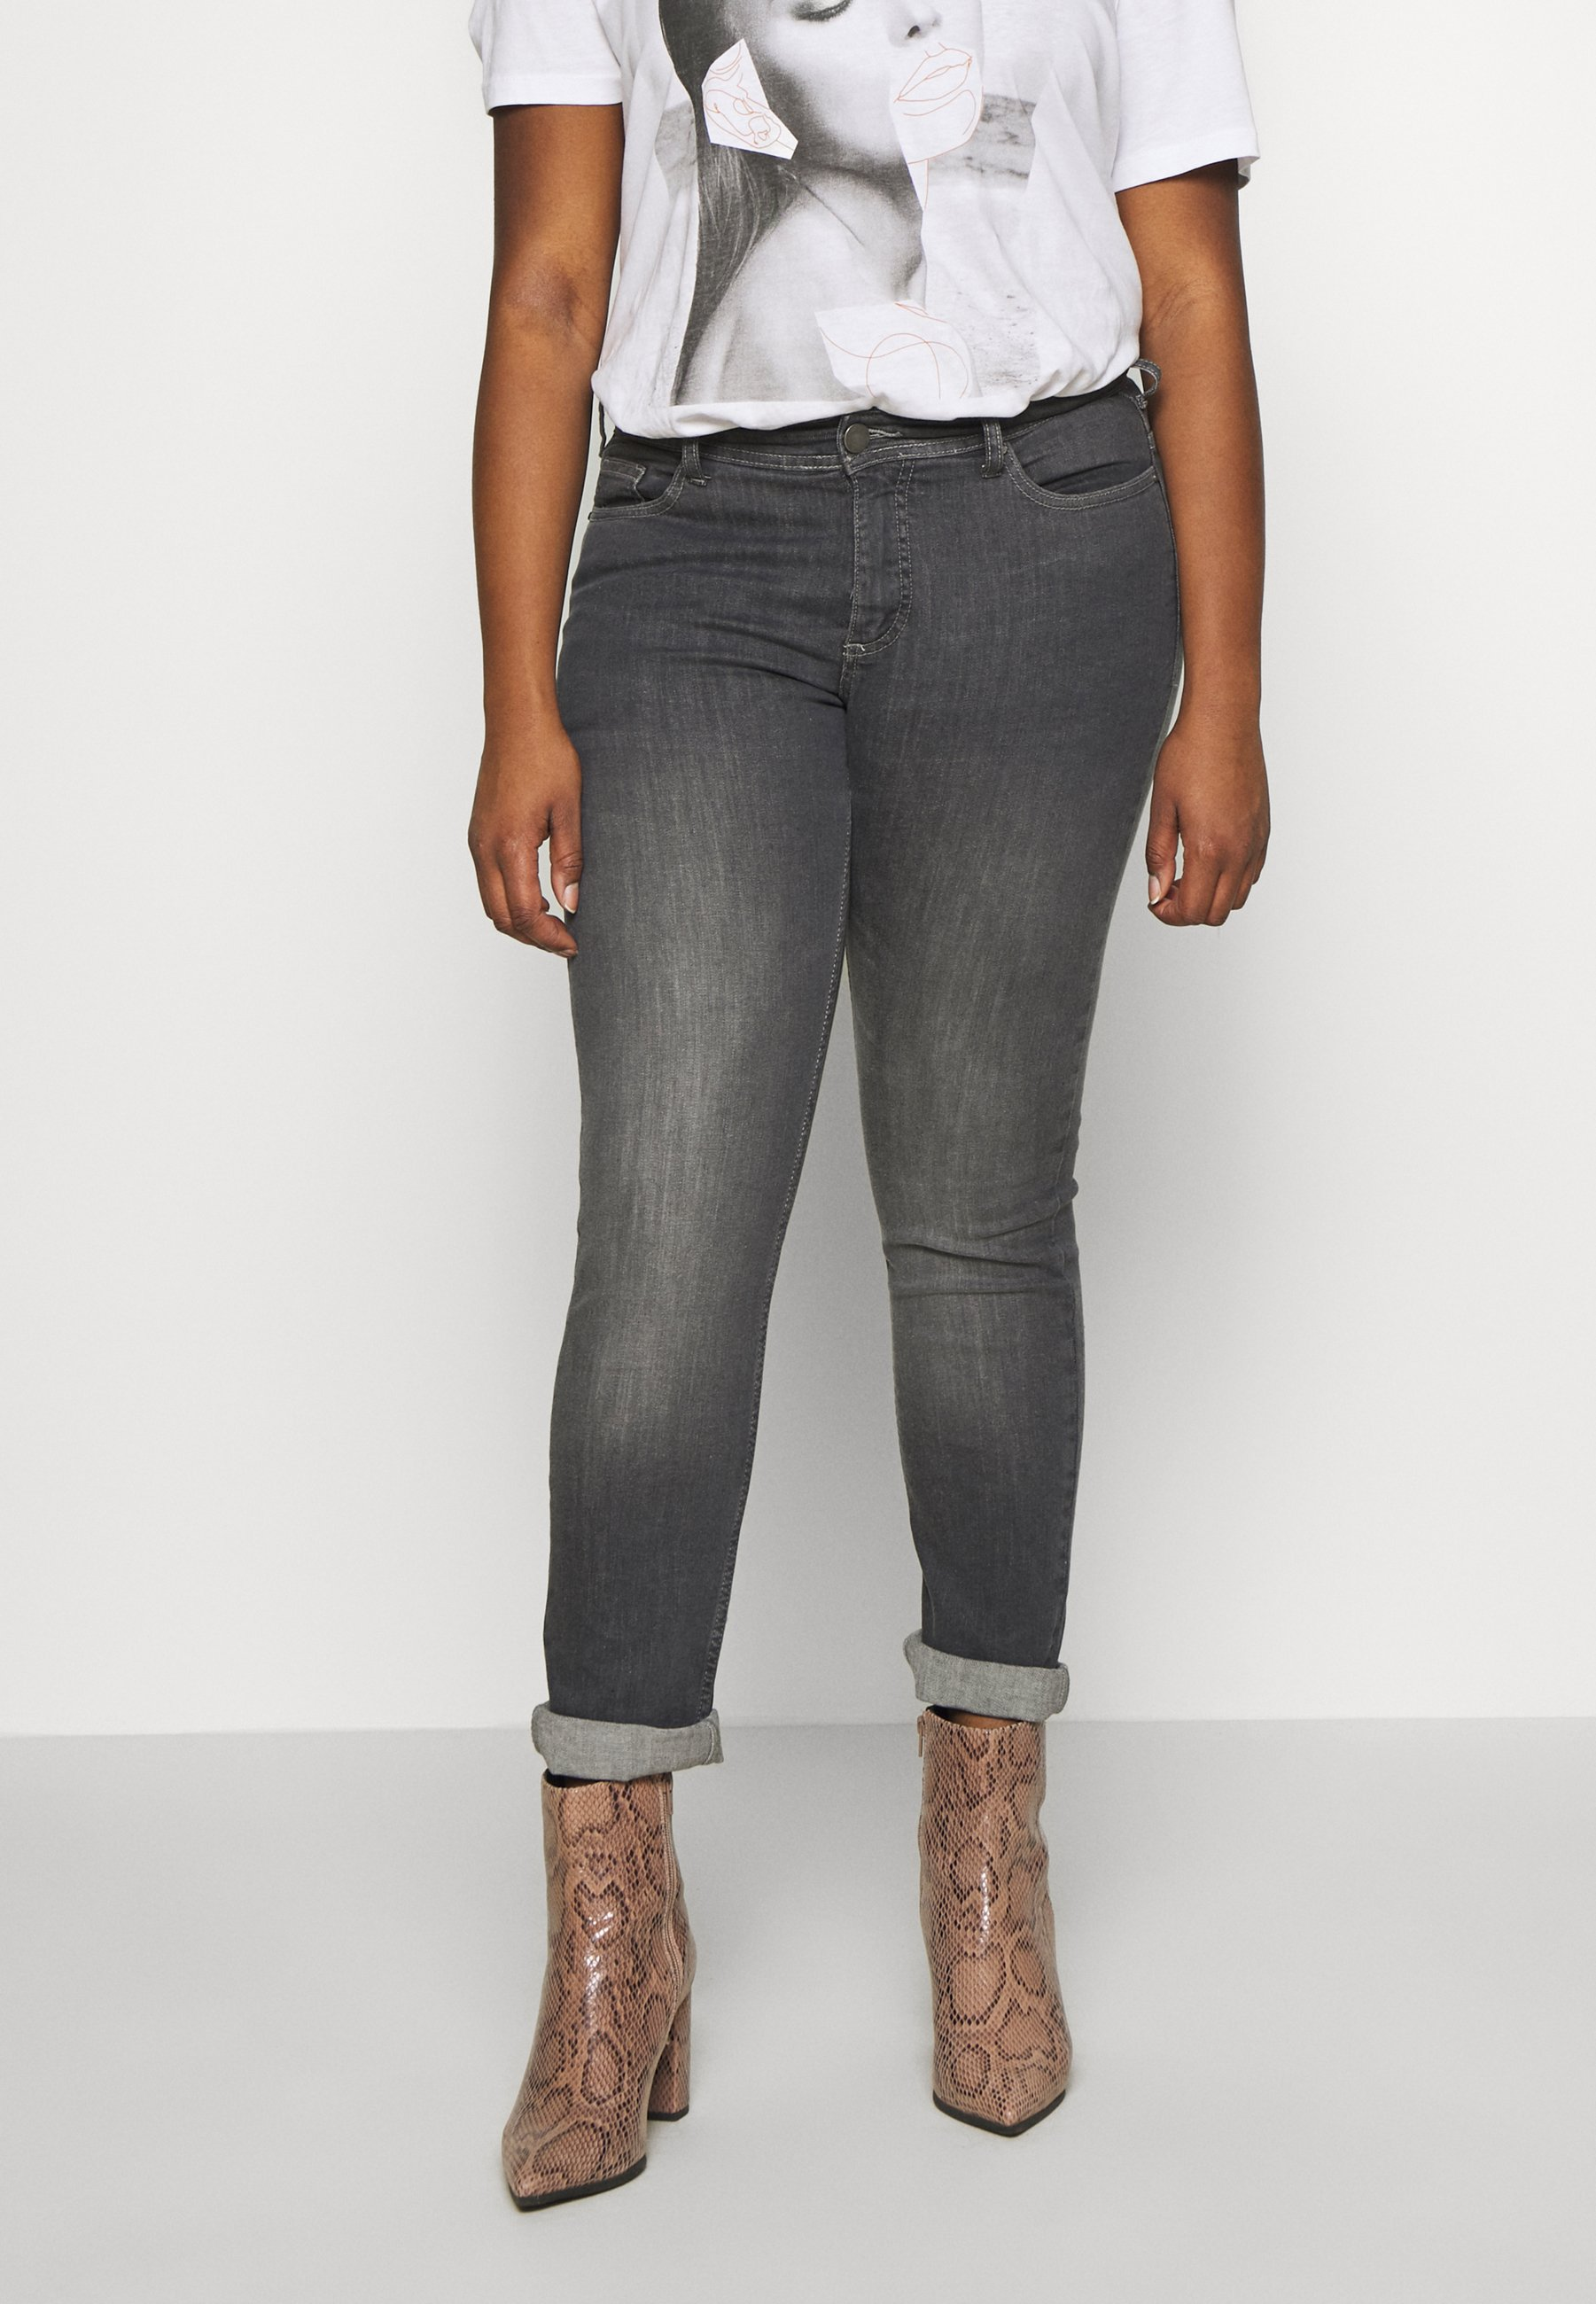 Korting Best Verkopende Dameskleding sdkjGX55lghisd Zizzi EMILY FIT Slim fit jeans grey denim zjHQv0P